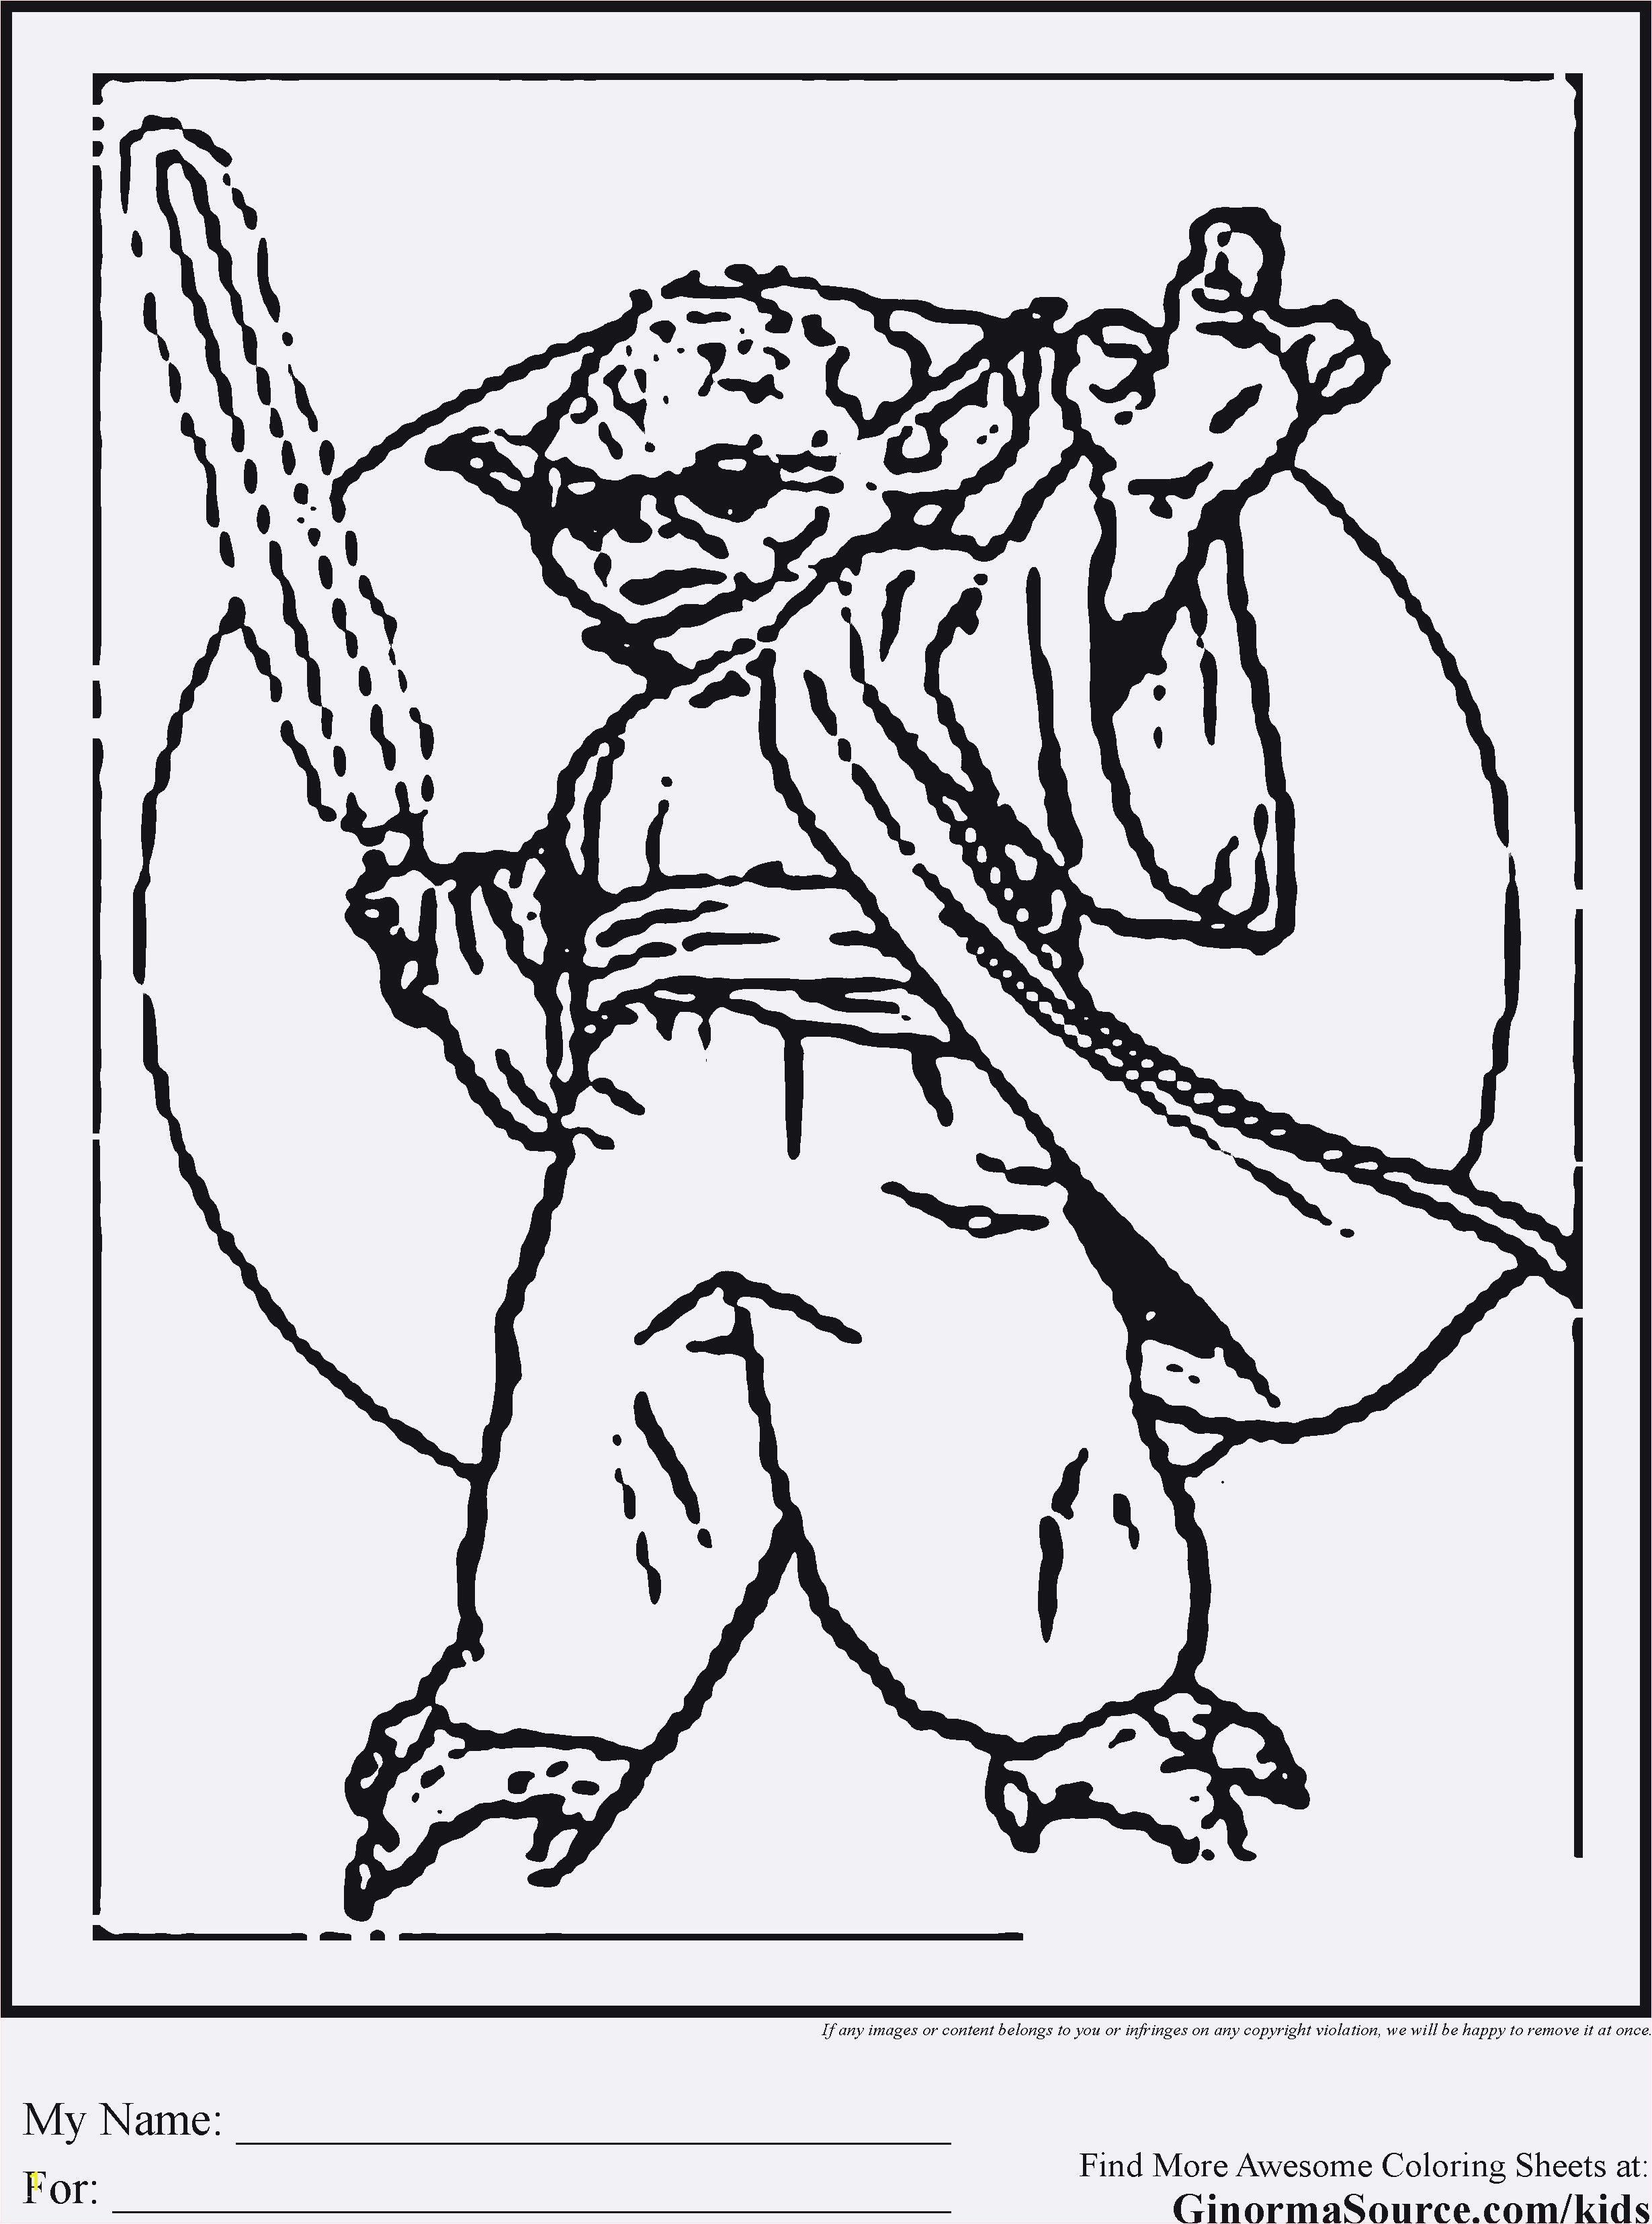 Jedi Knight Coloring Pages Ausmalbilder Star Wars Jedi